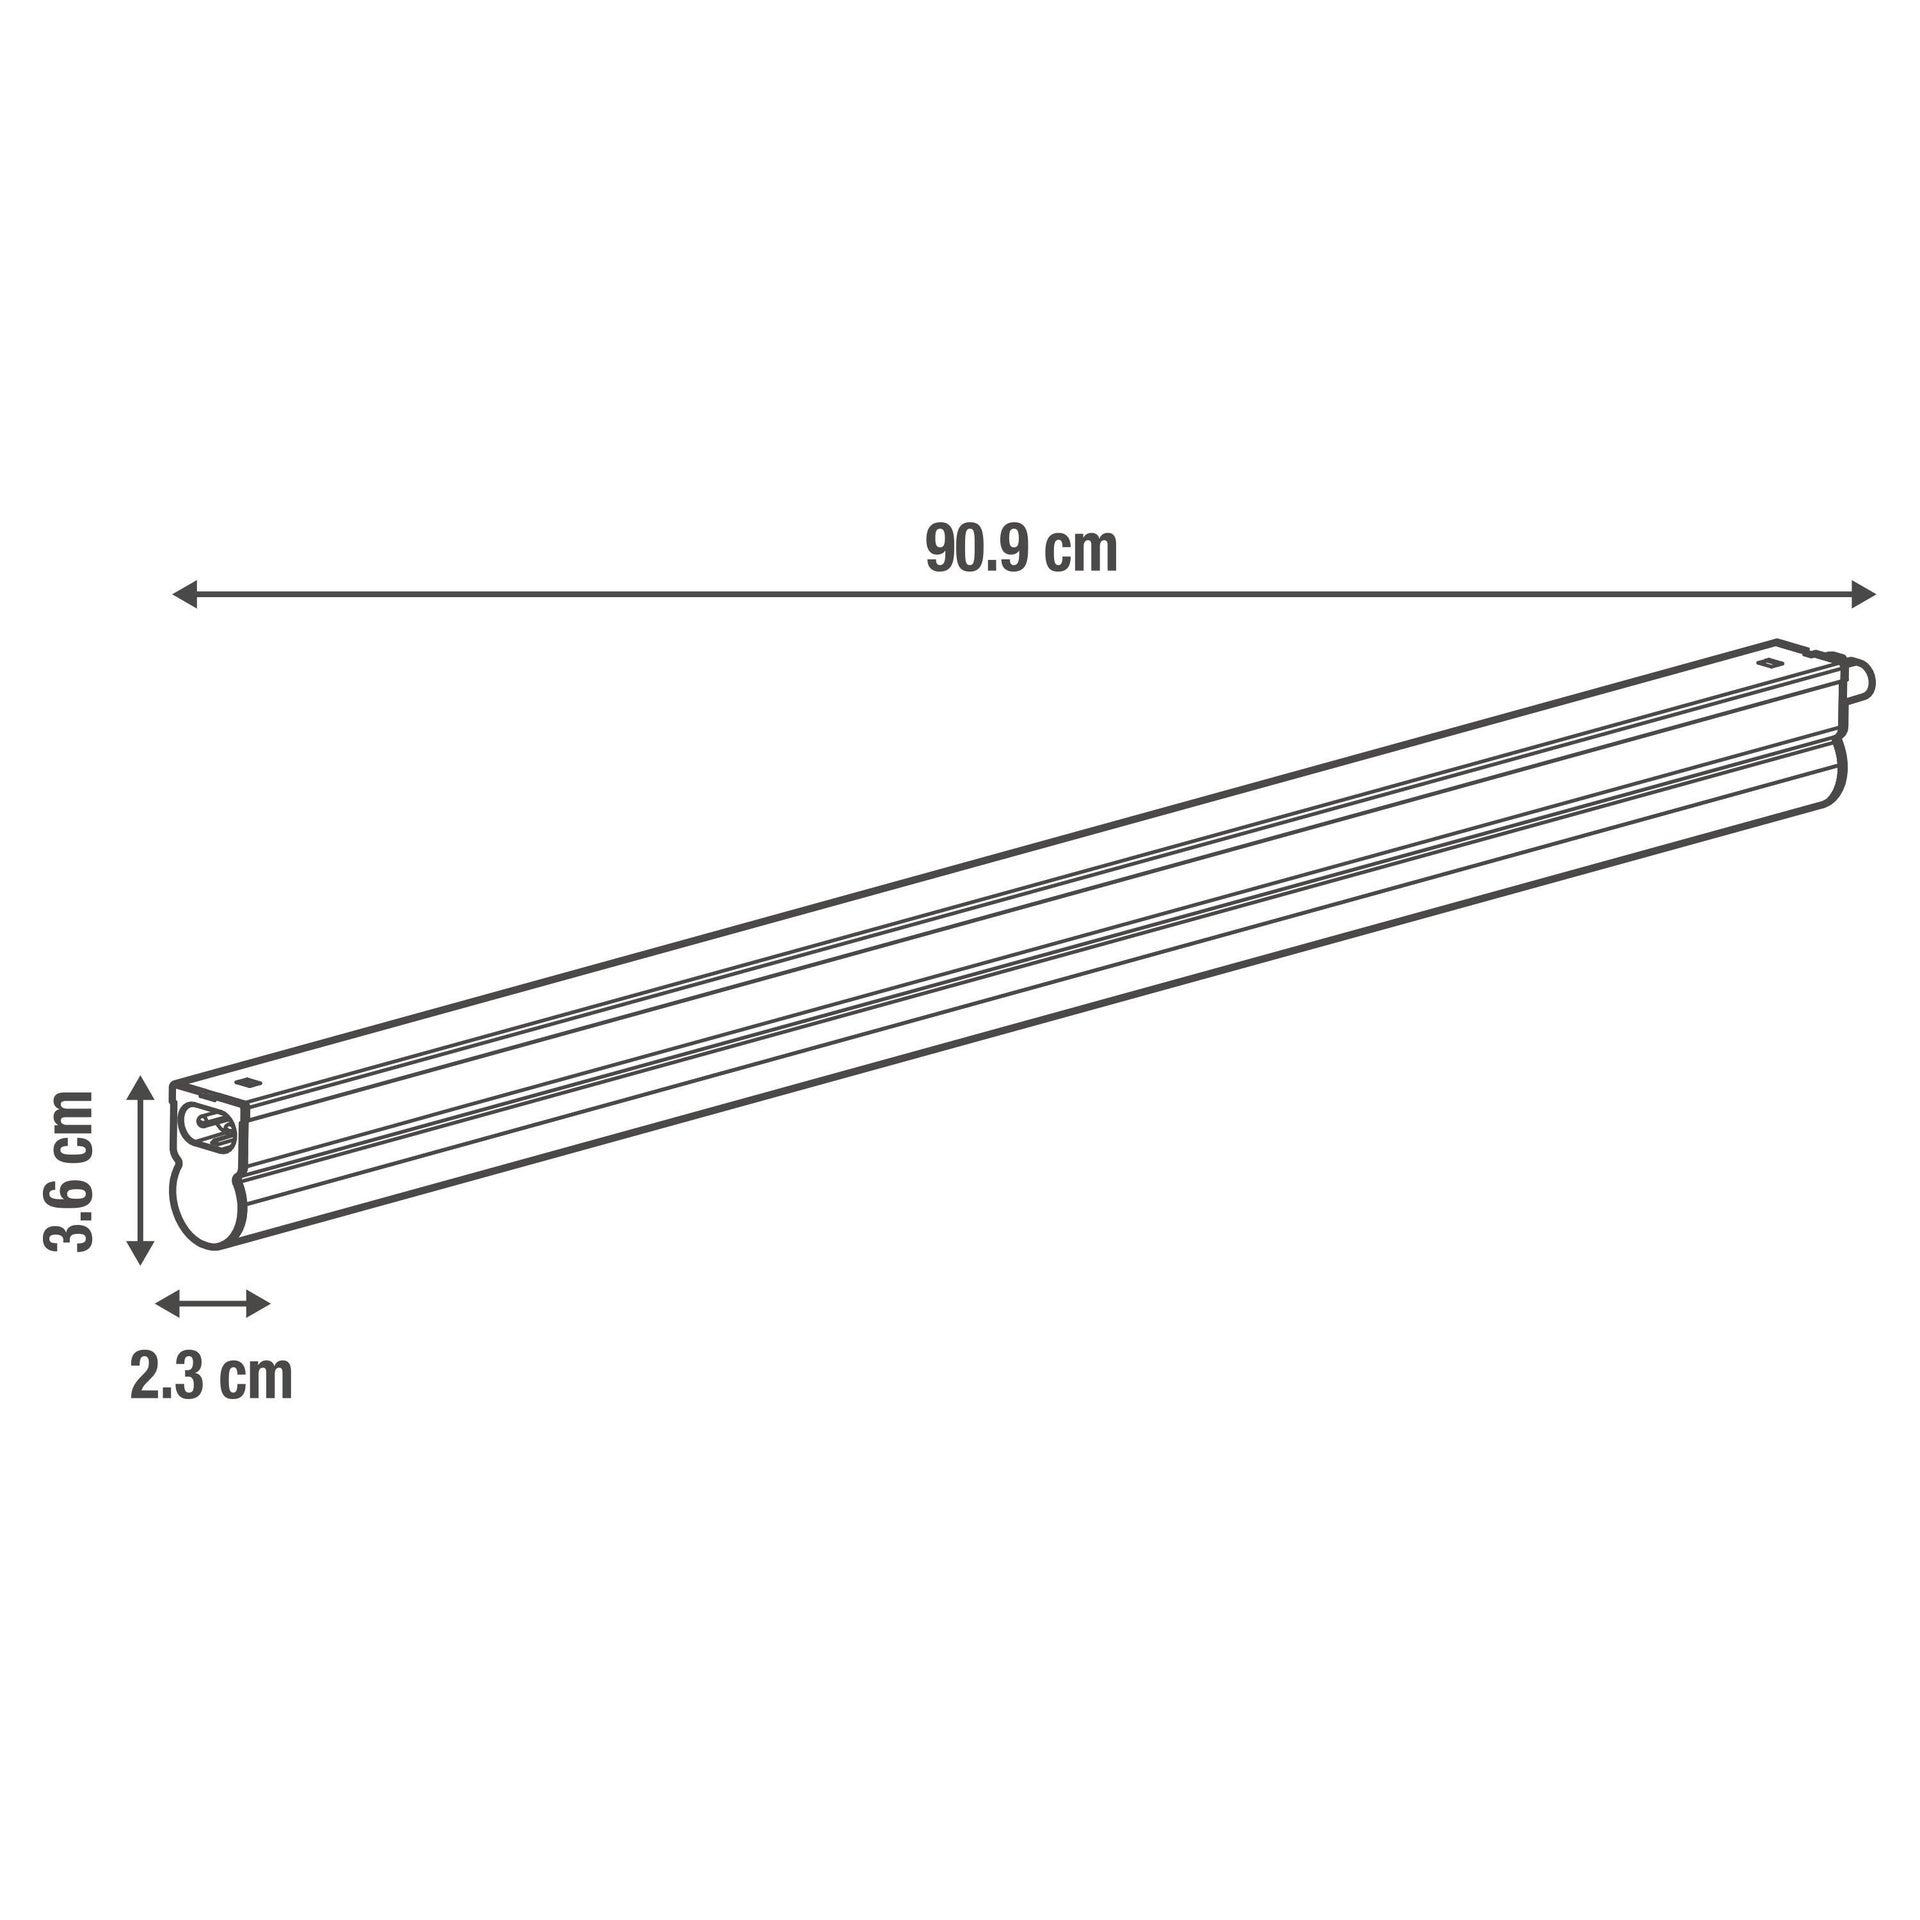 Reglette Moss LED integrato 90.9 cm 11W 1250LM IP20 Inspire - 3